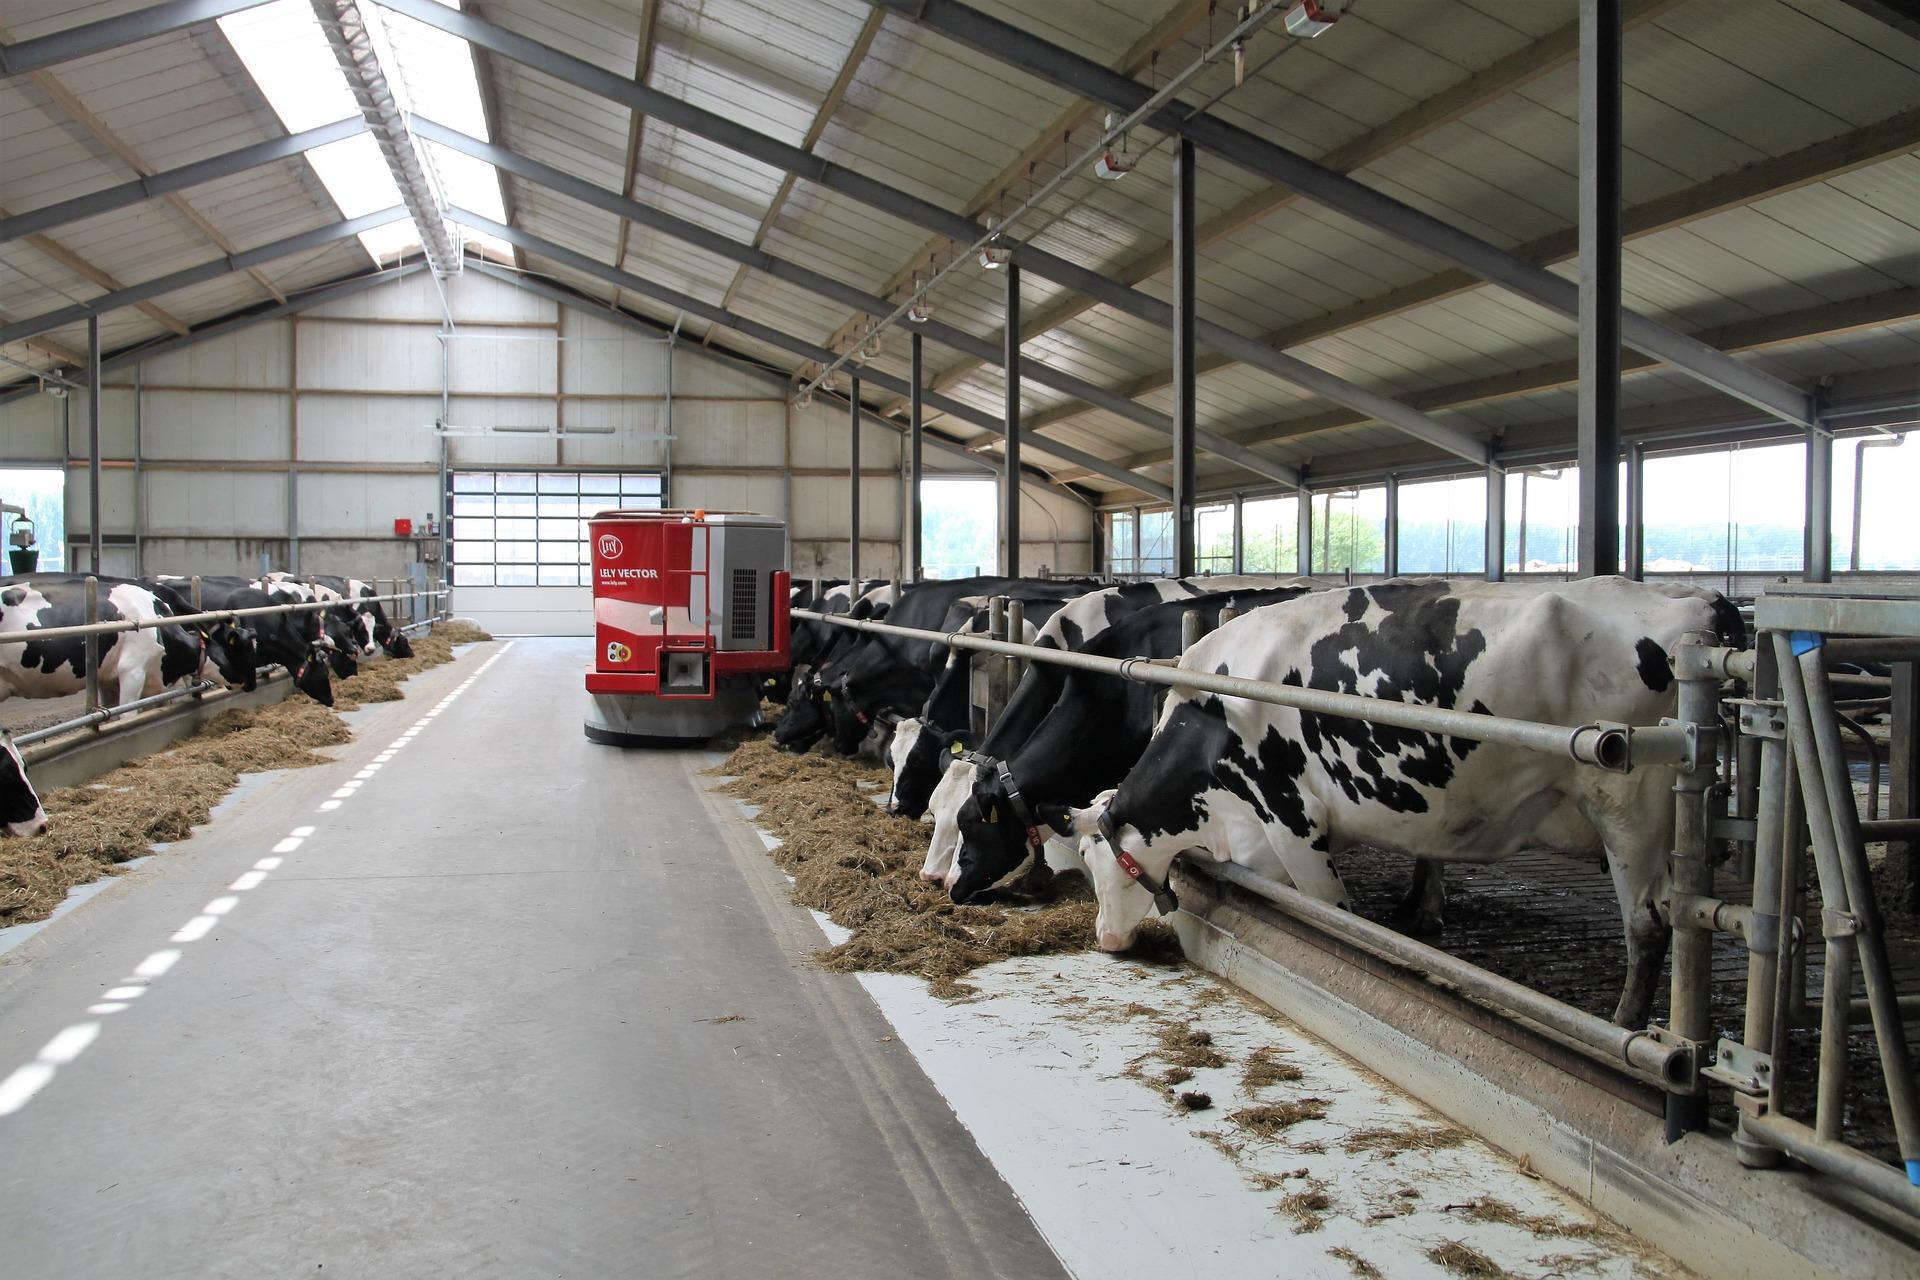 RS: Podsticaji za nabavku mašina i opreme za stočarsku proizvodnju (pravilnik)